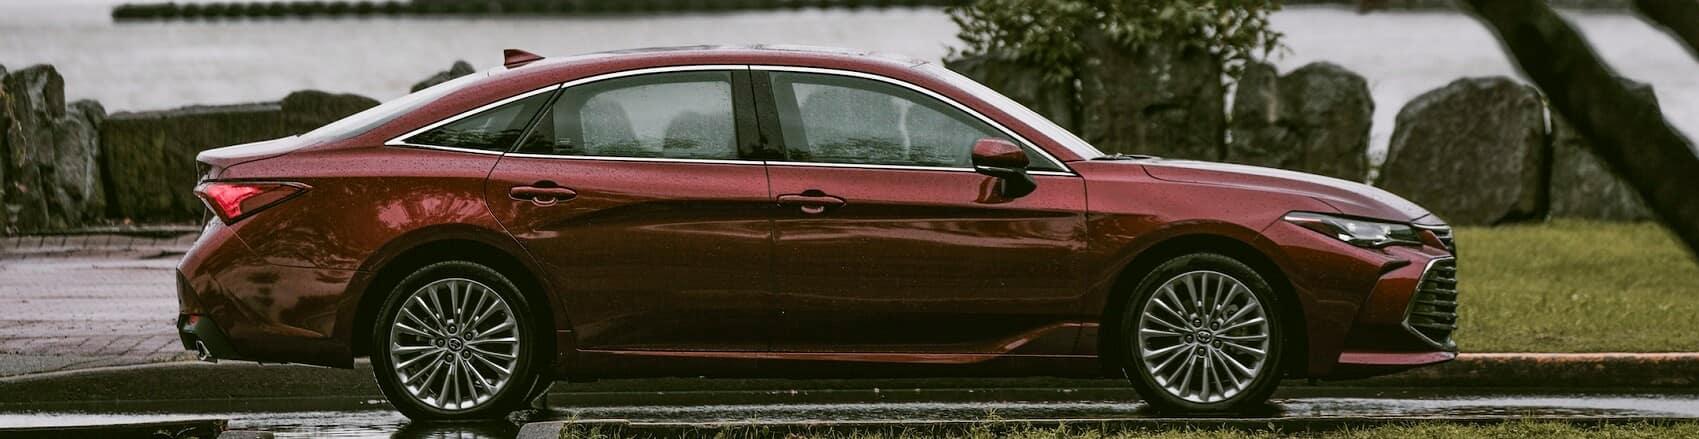 Toyota Avalon vs Honda Accord